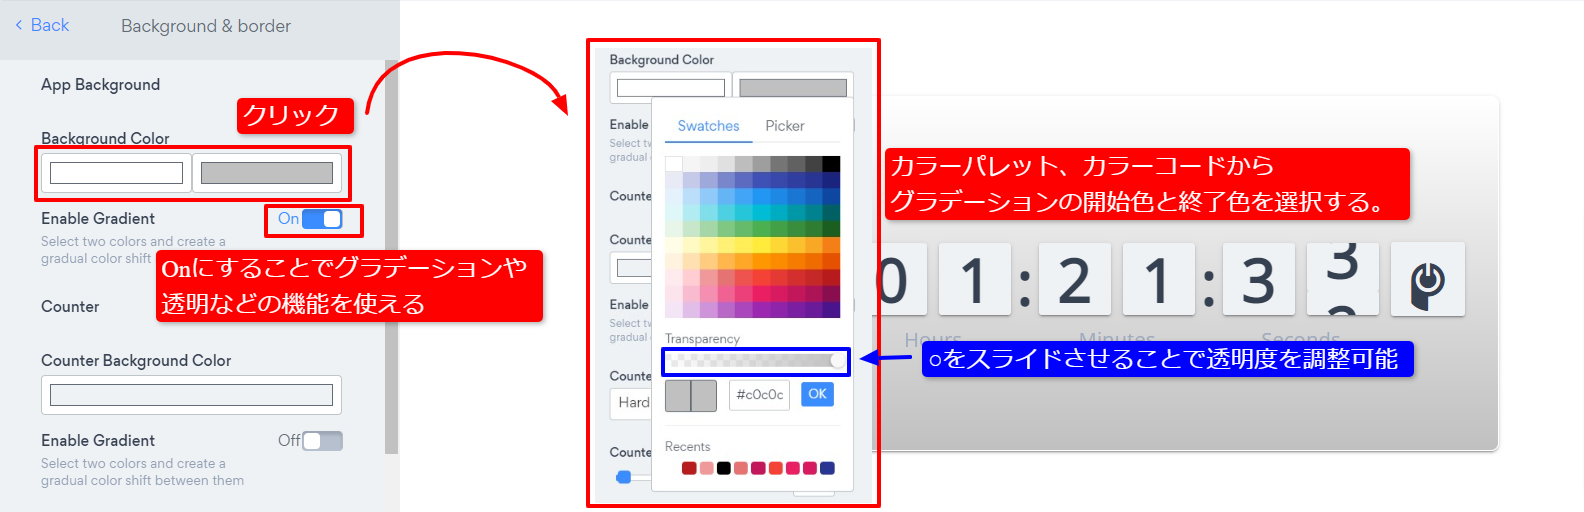 Countdown Timer   Cart Timerで背景をグラデーションや透明にしたい場合